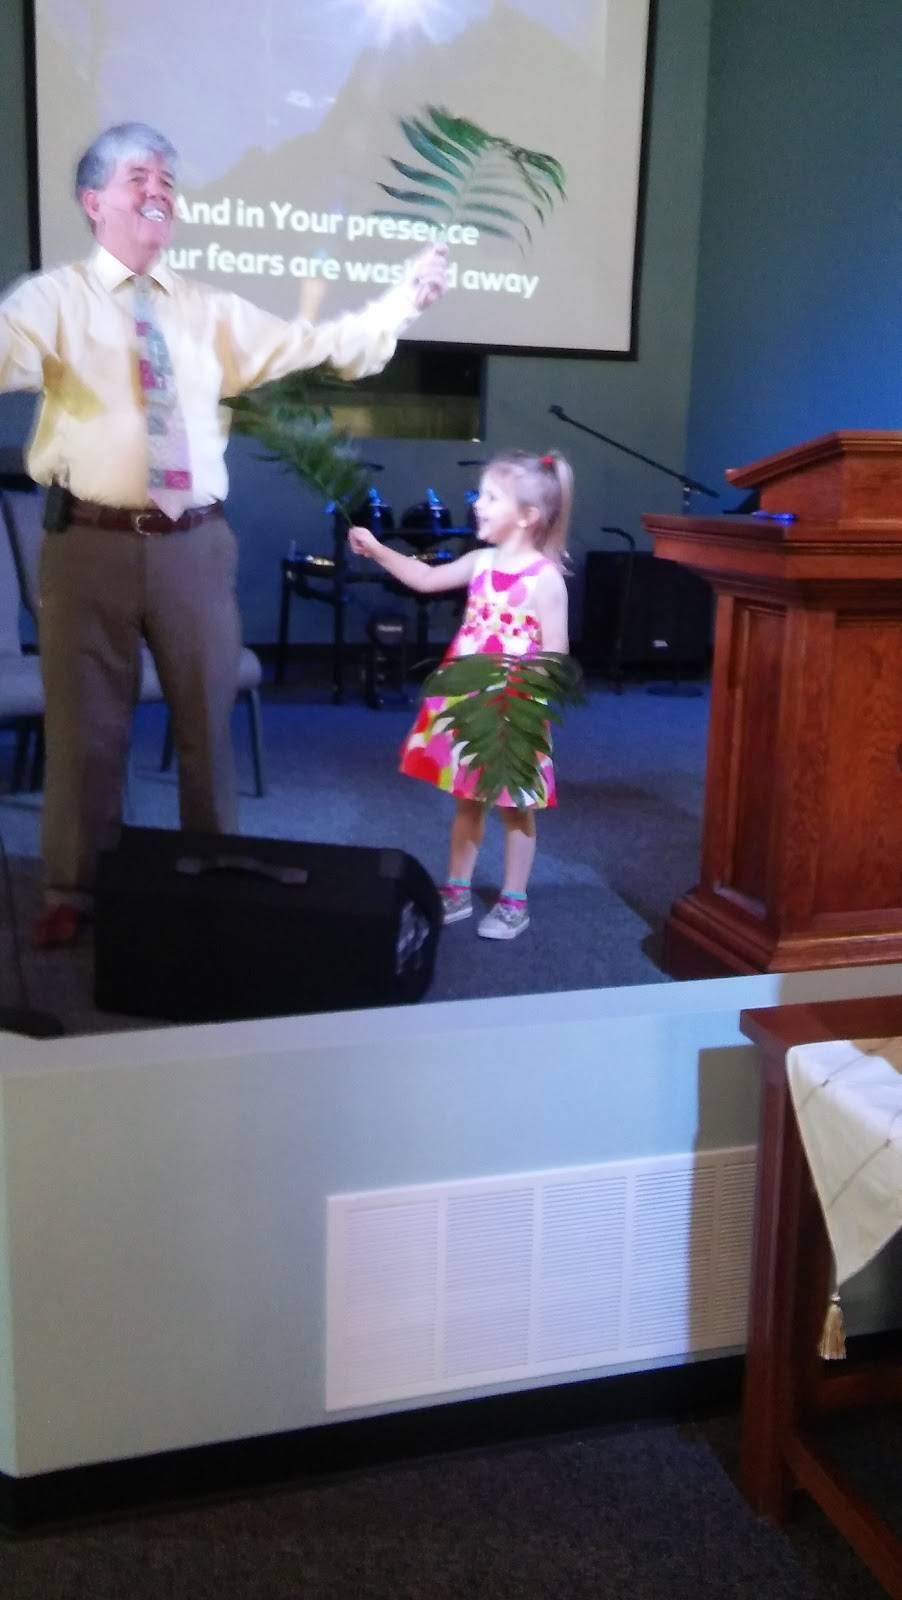 Cedar View General Baptist Church - church  | Photo 4 of 9 | Address: 3716 Ruth Dr, Granite City, IL 62040, USA | Phone: (618) 931-5330